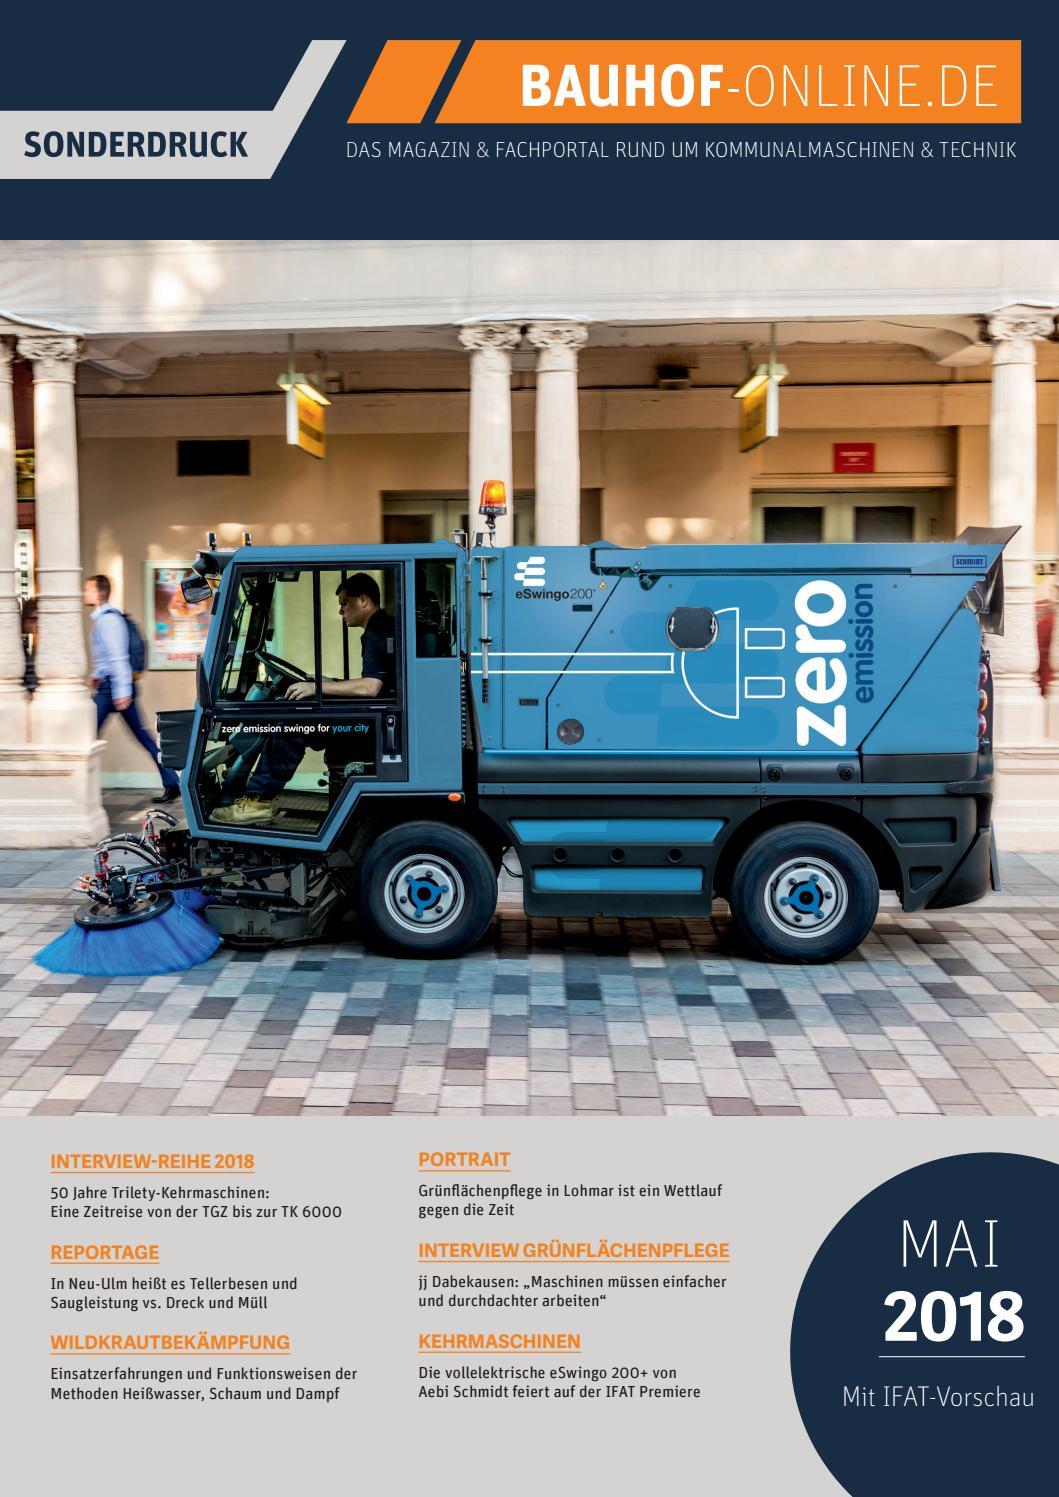 Bauhof-Online Magazin 05/2018 - Mai - SONDERDRUCK by KANAT Media ...